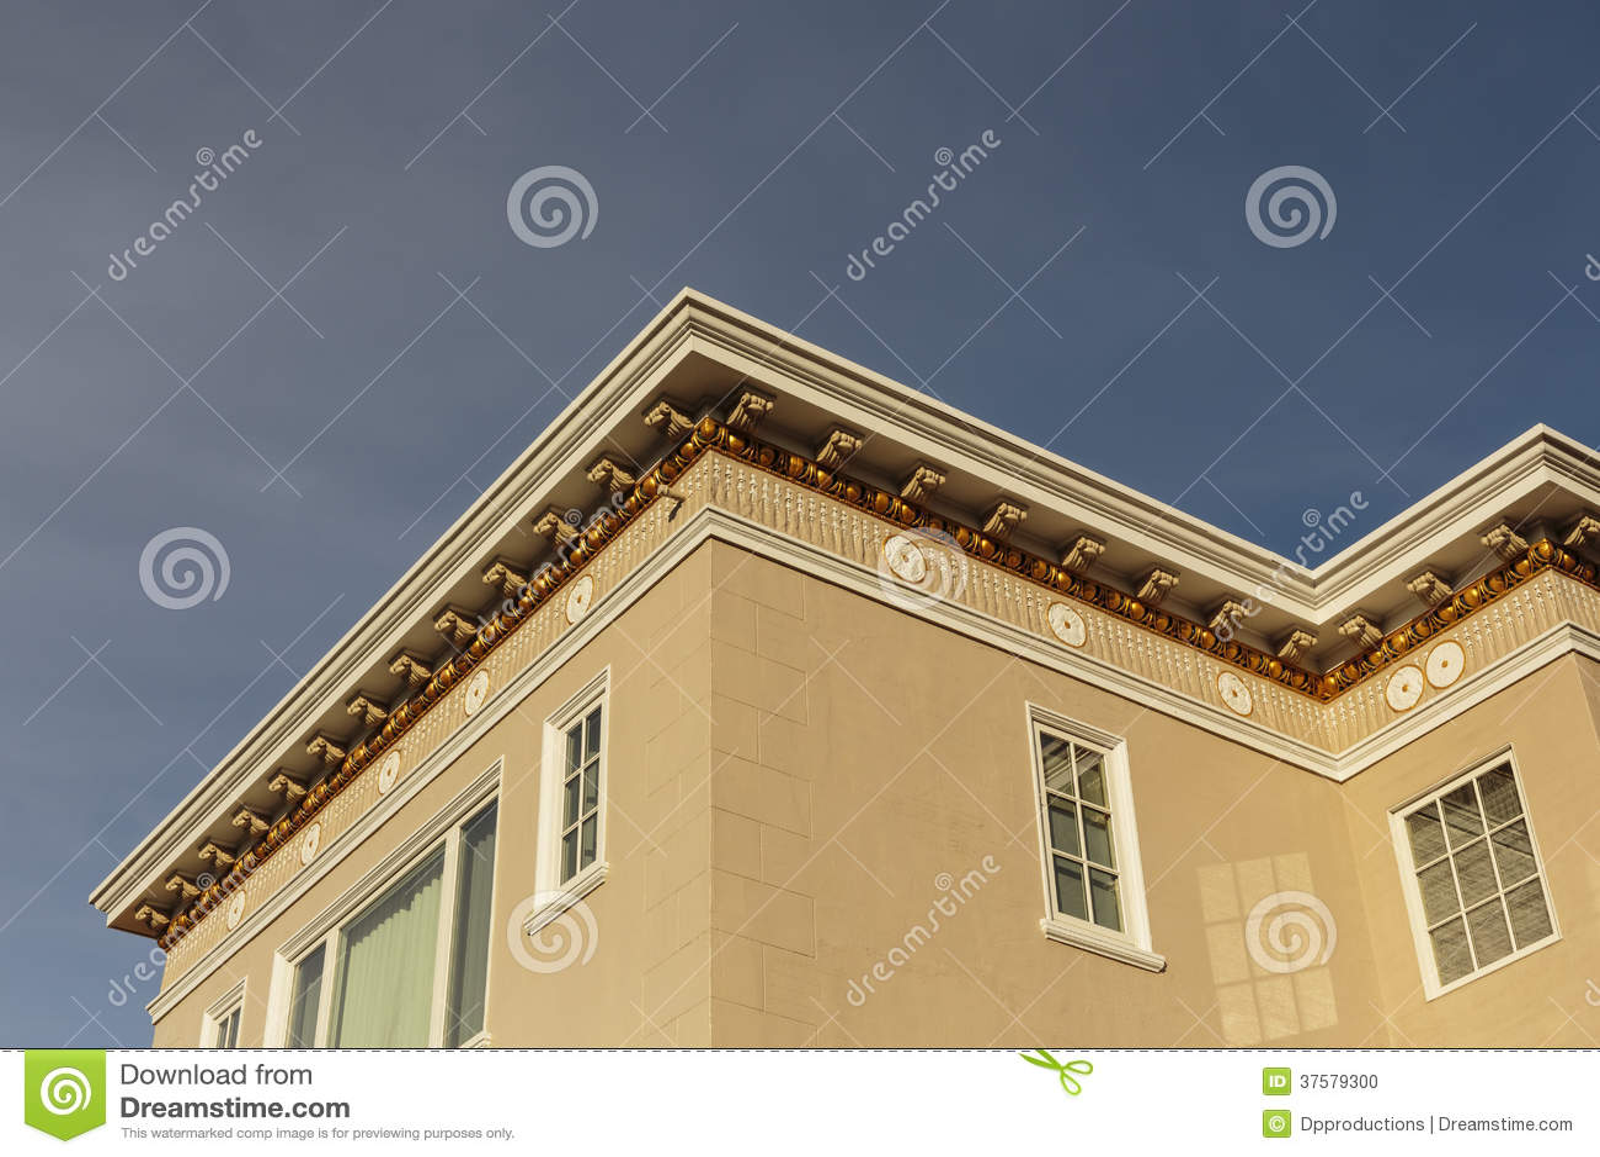 Upscale house roof and cornice detail stock photo image for Una cornice a casa libera